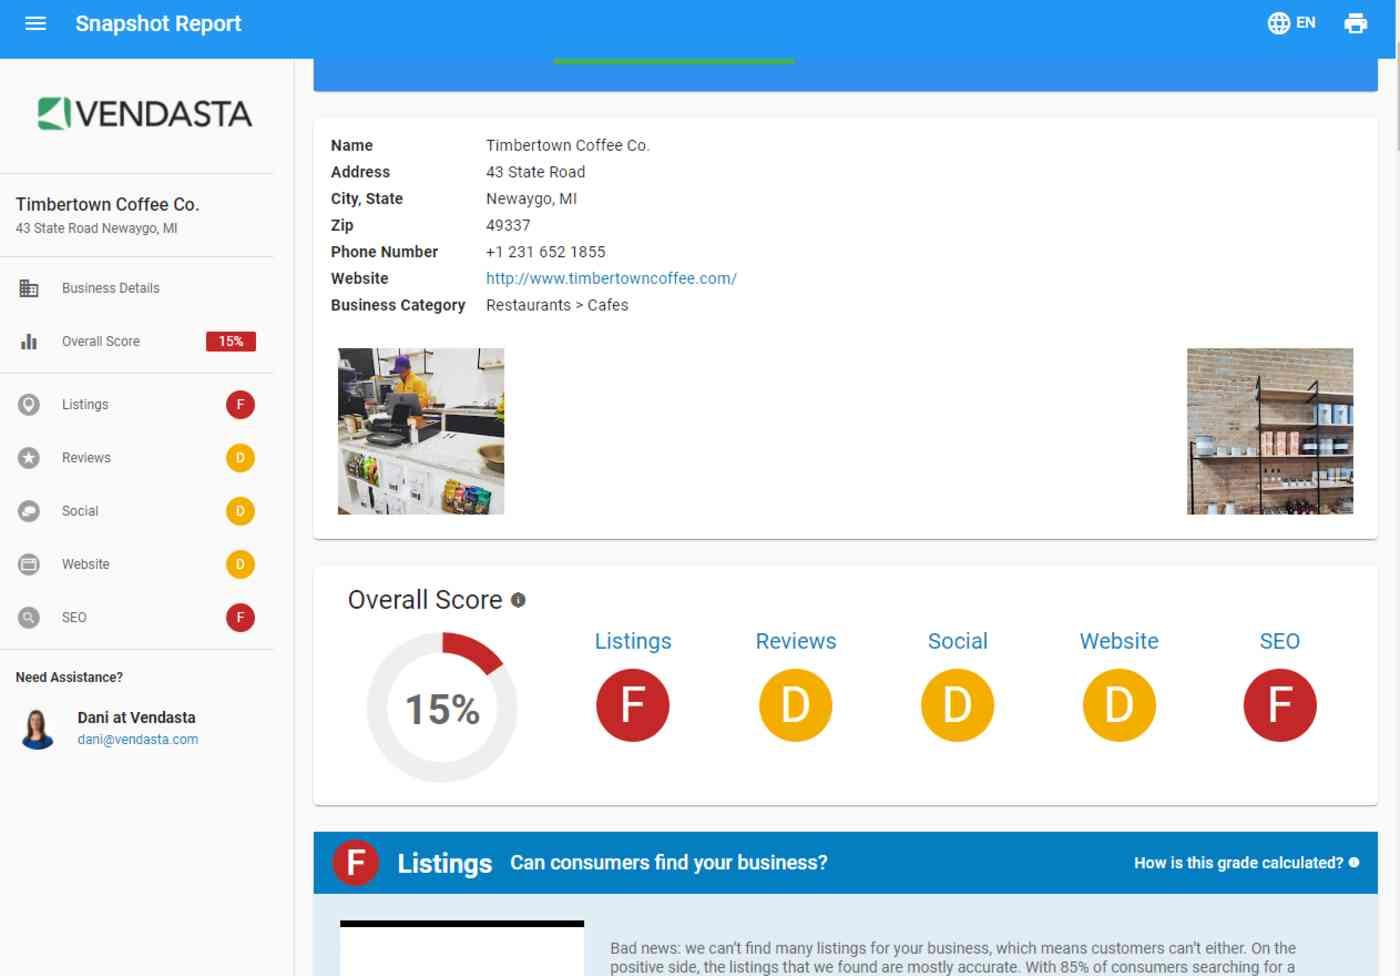 A screenshot of a Vendasta report